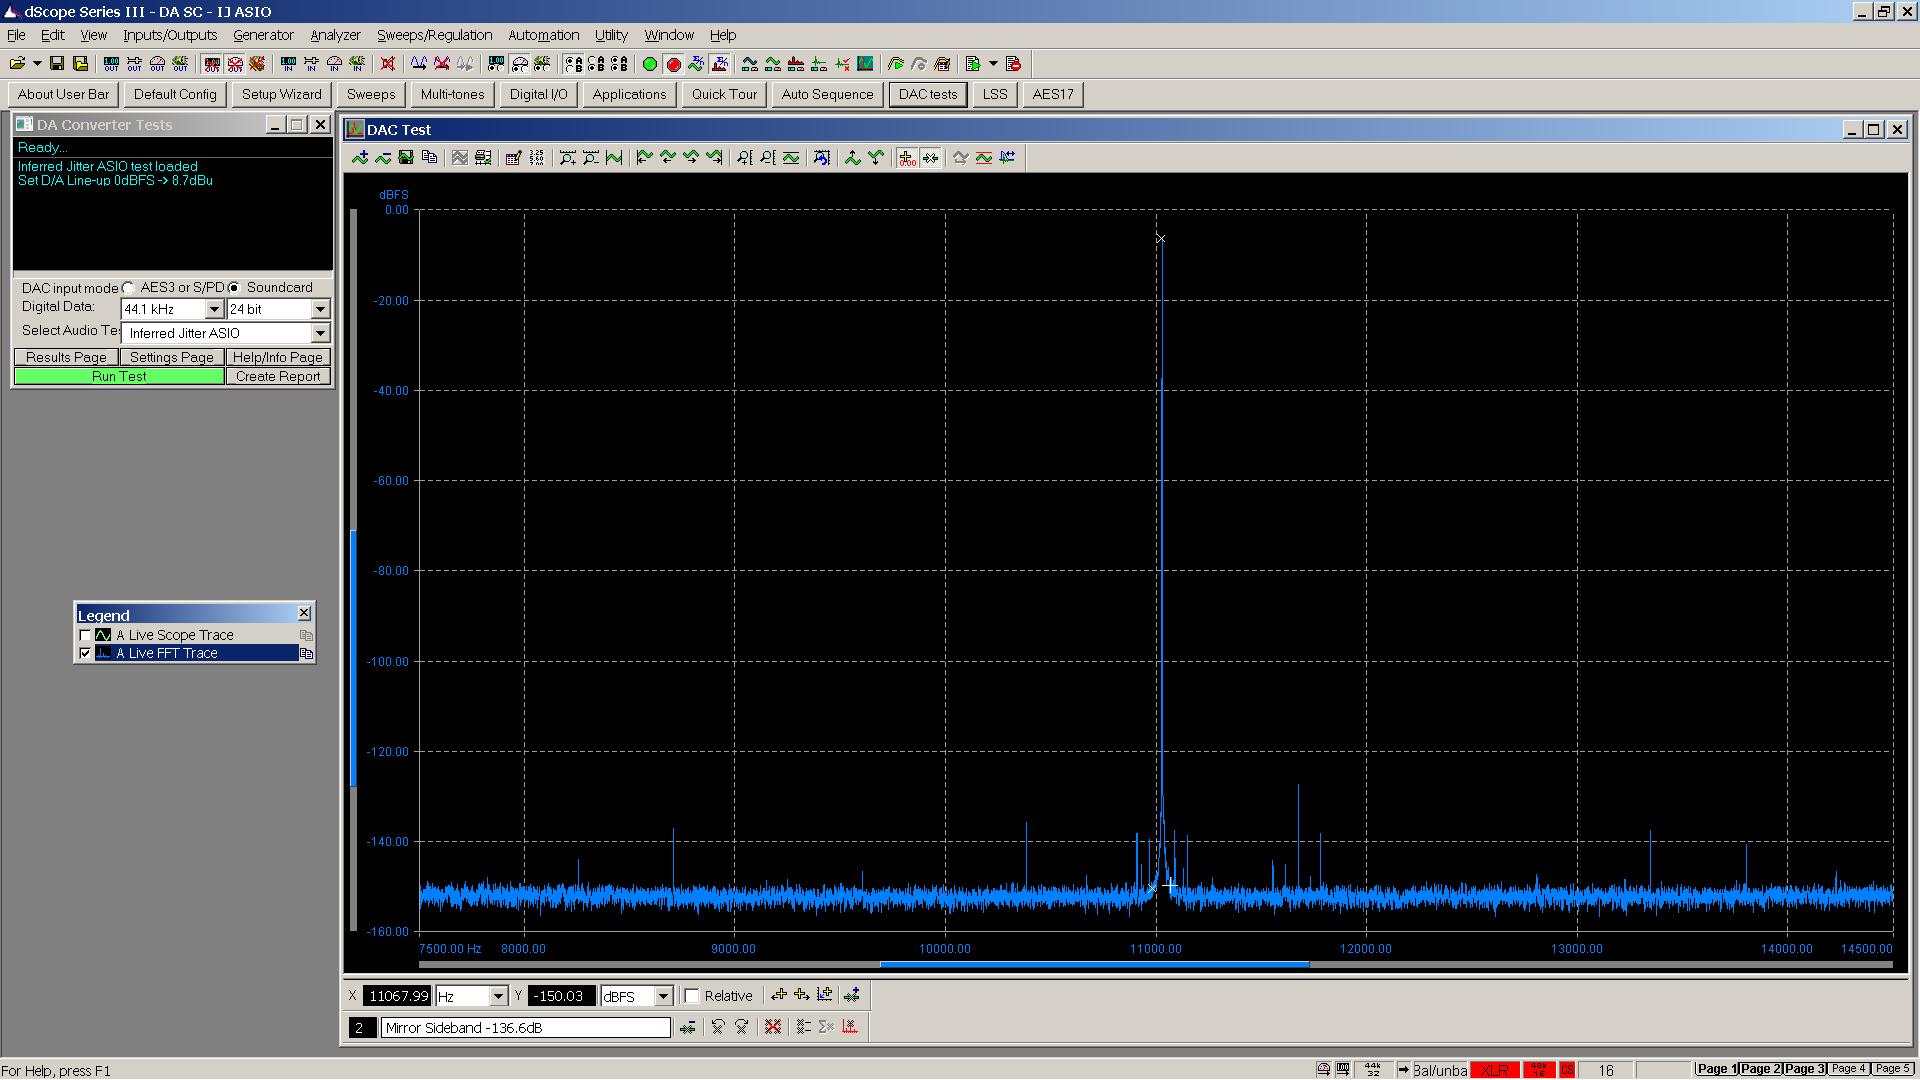 20170327 Modi MB inferred jitter - SPDIF - DU-U8.png